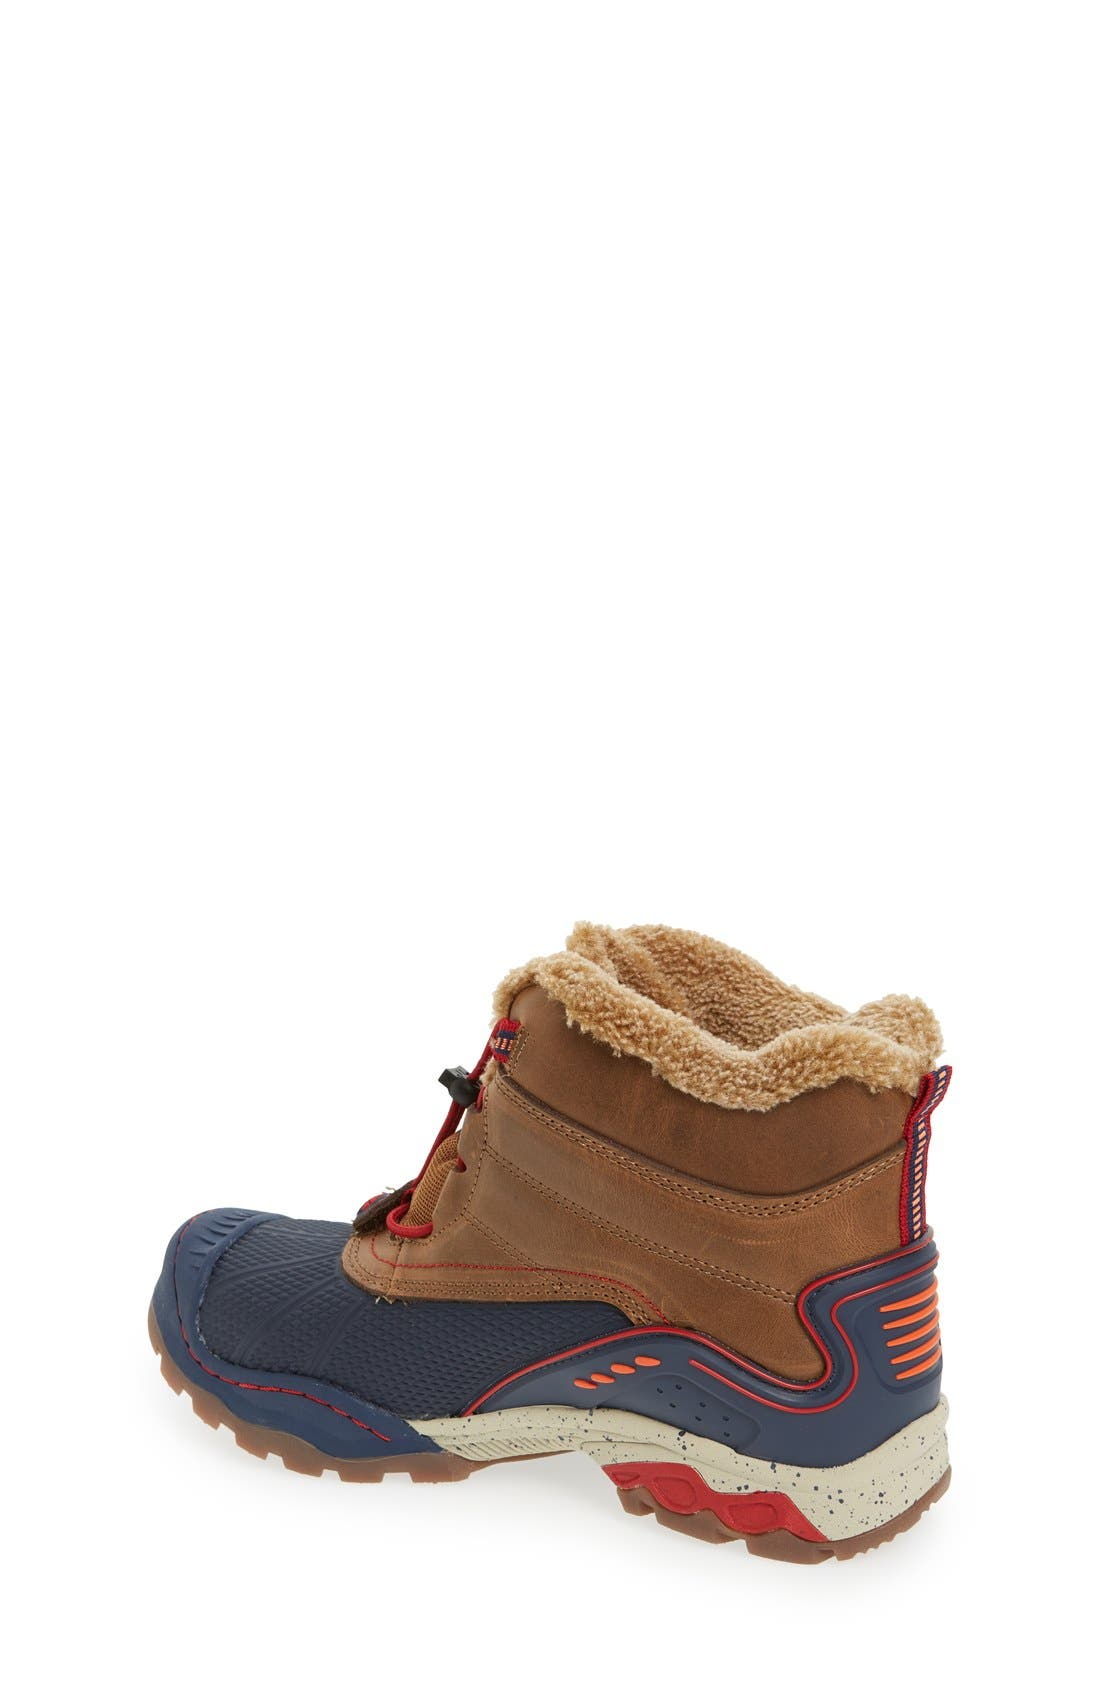 'Baltoro 3' Waterproof Insulated Snow Boot,                             Alternate thumbnail 2, color,                             BROWN/ NAVY